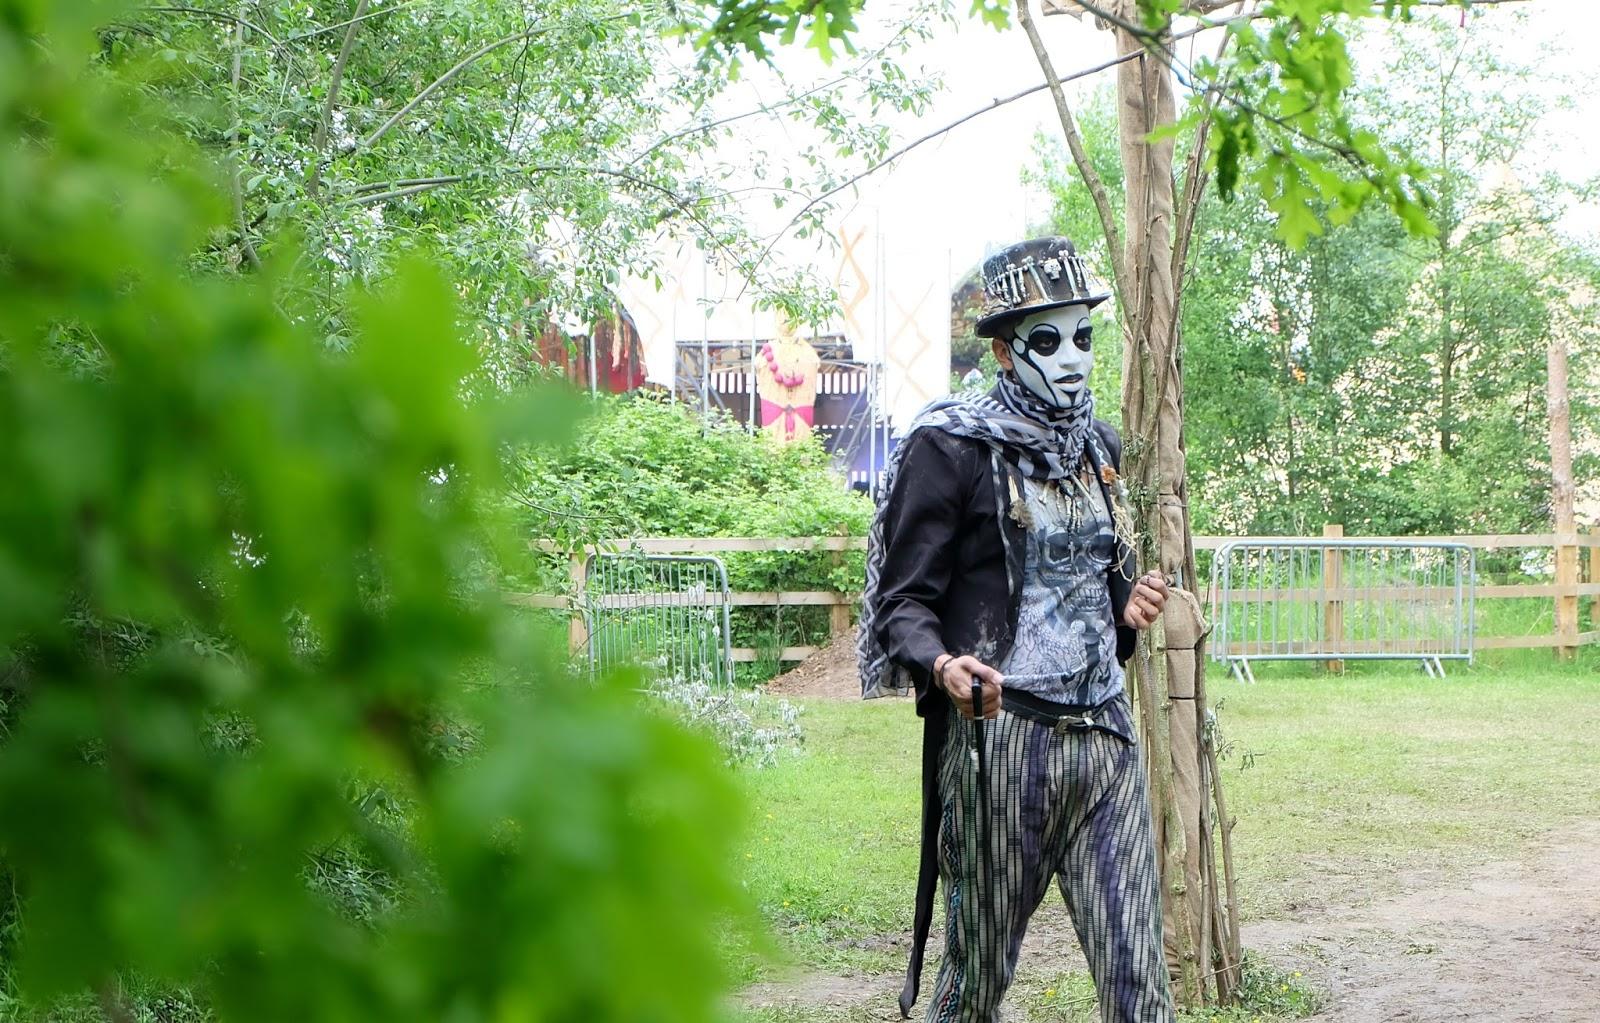 Lost village festival 2016